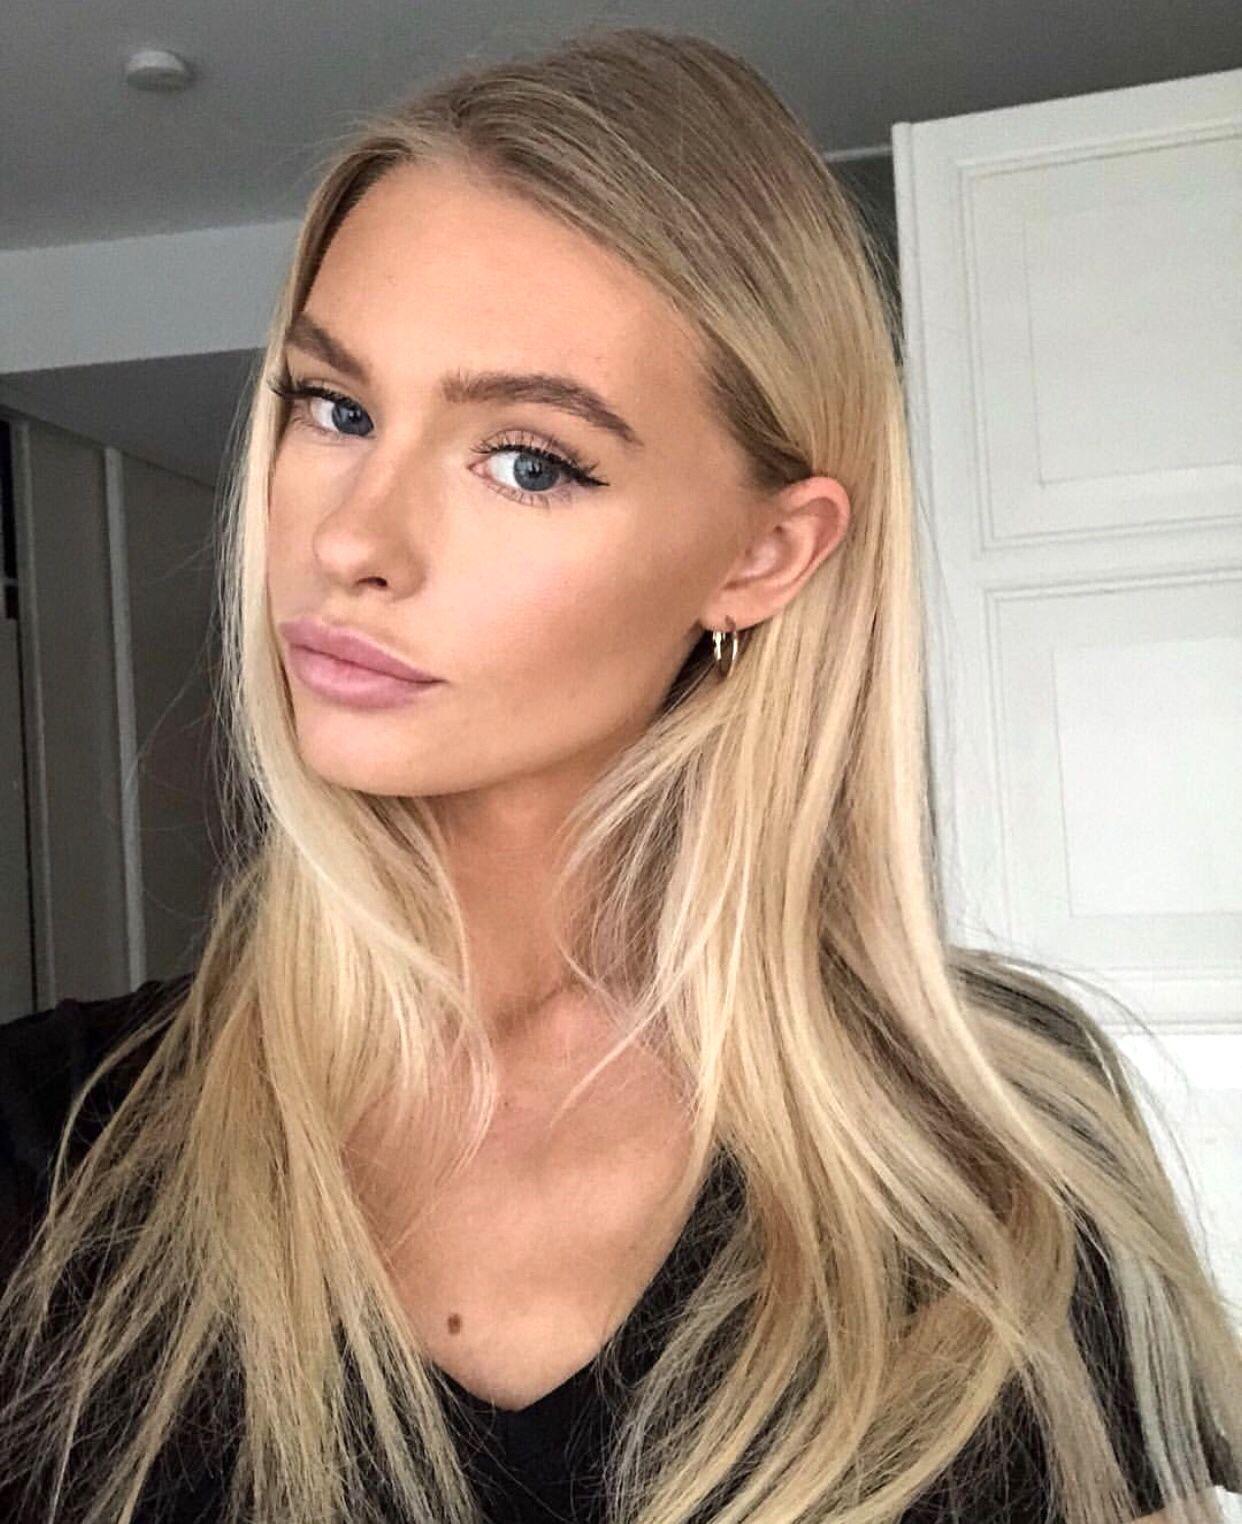 8 amazing eye makeup hacks that are borderline genius